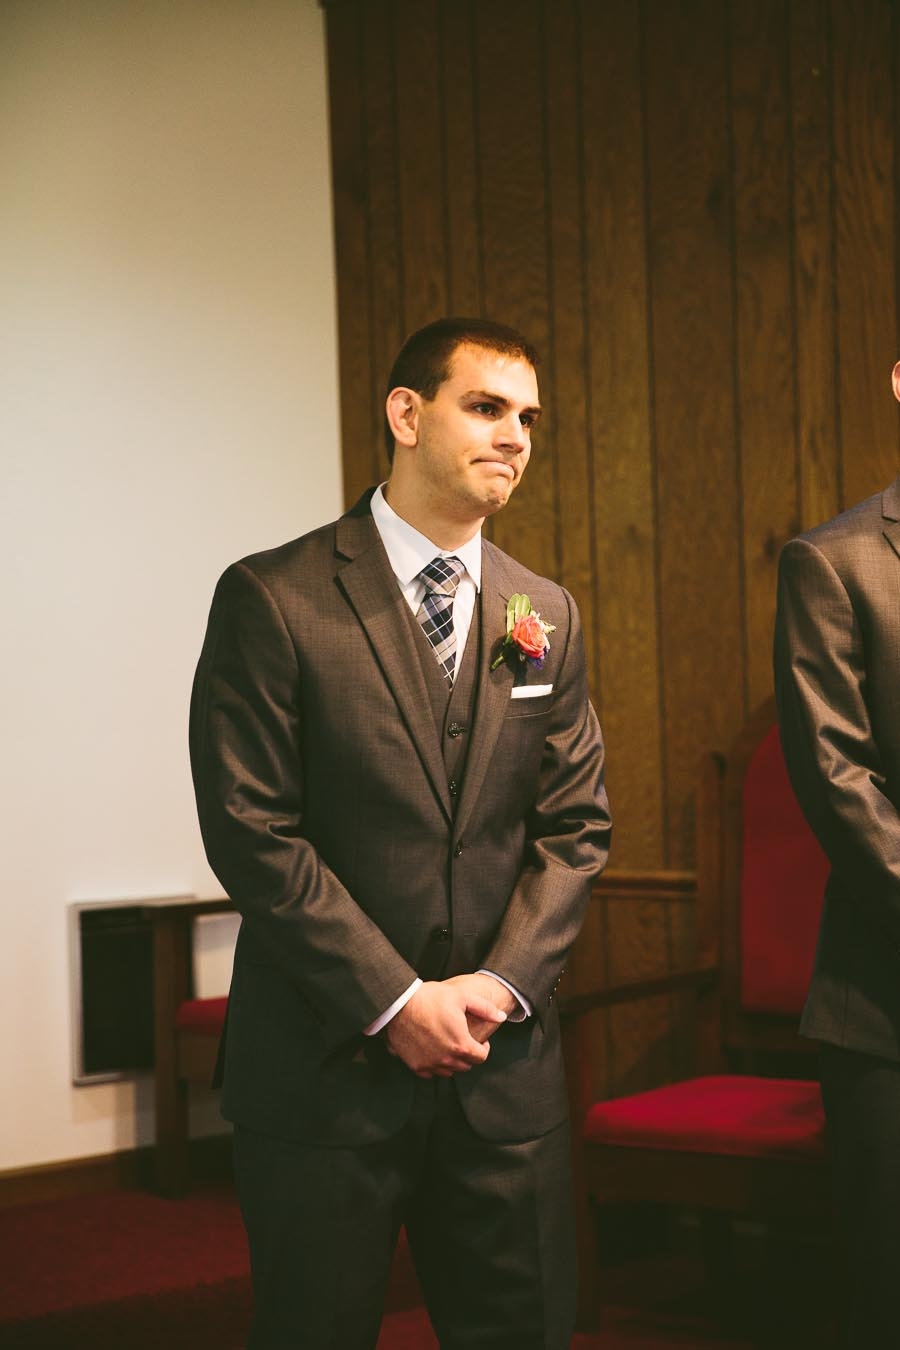 columbus-delaware-ohio-wedding-photography-all-occasions-75.jpg